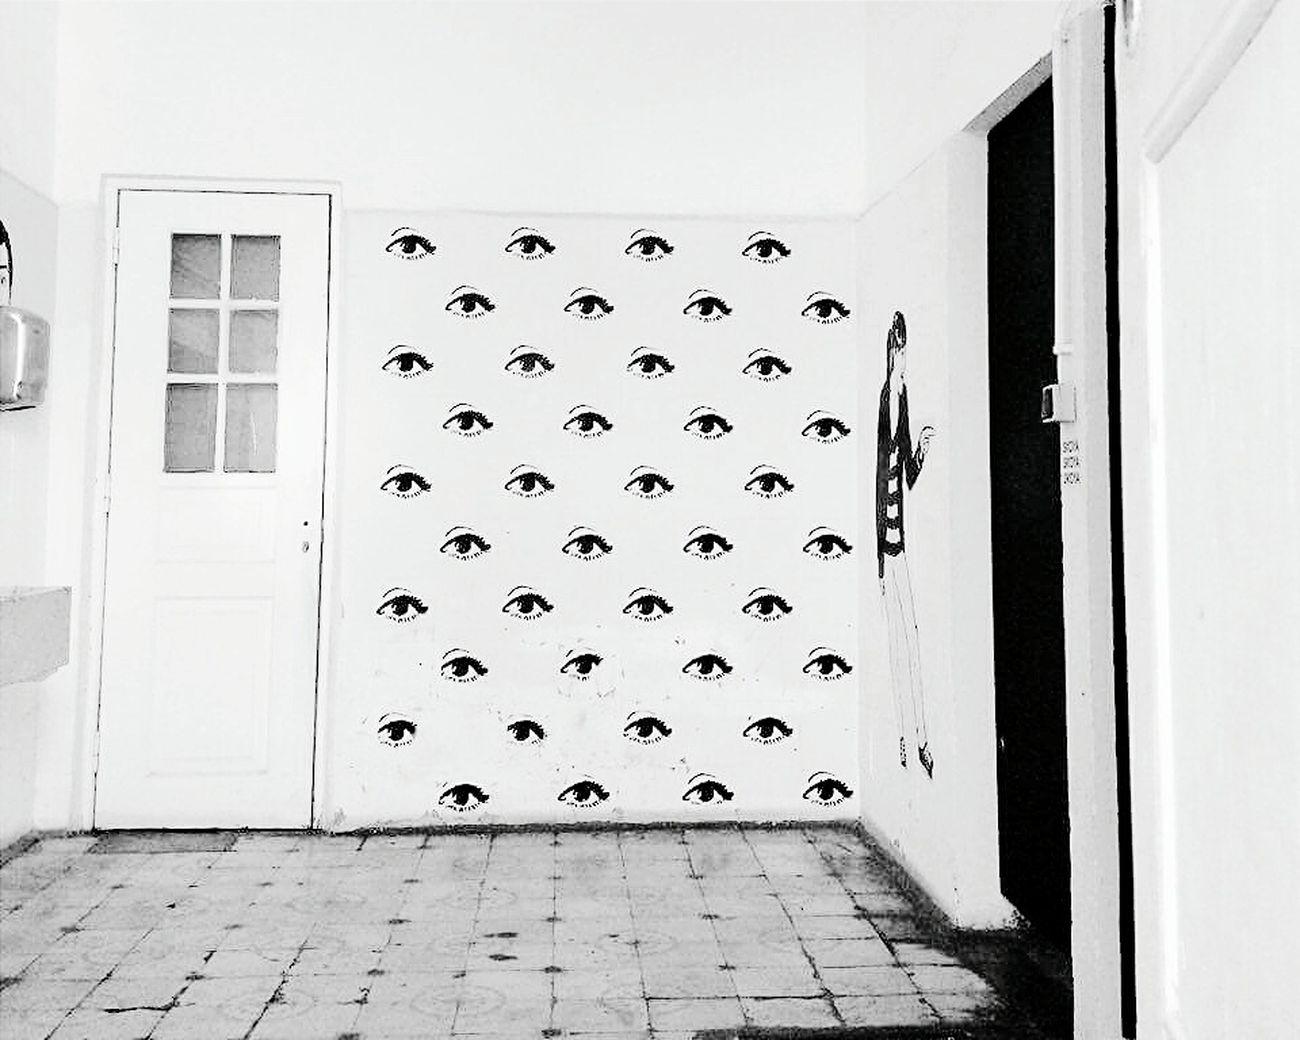 Public Places Lisbon Lx Factory Blackandwhite Black And White Eye Bathroom Pattern